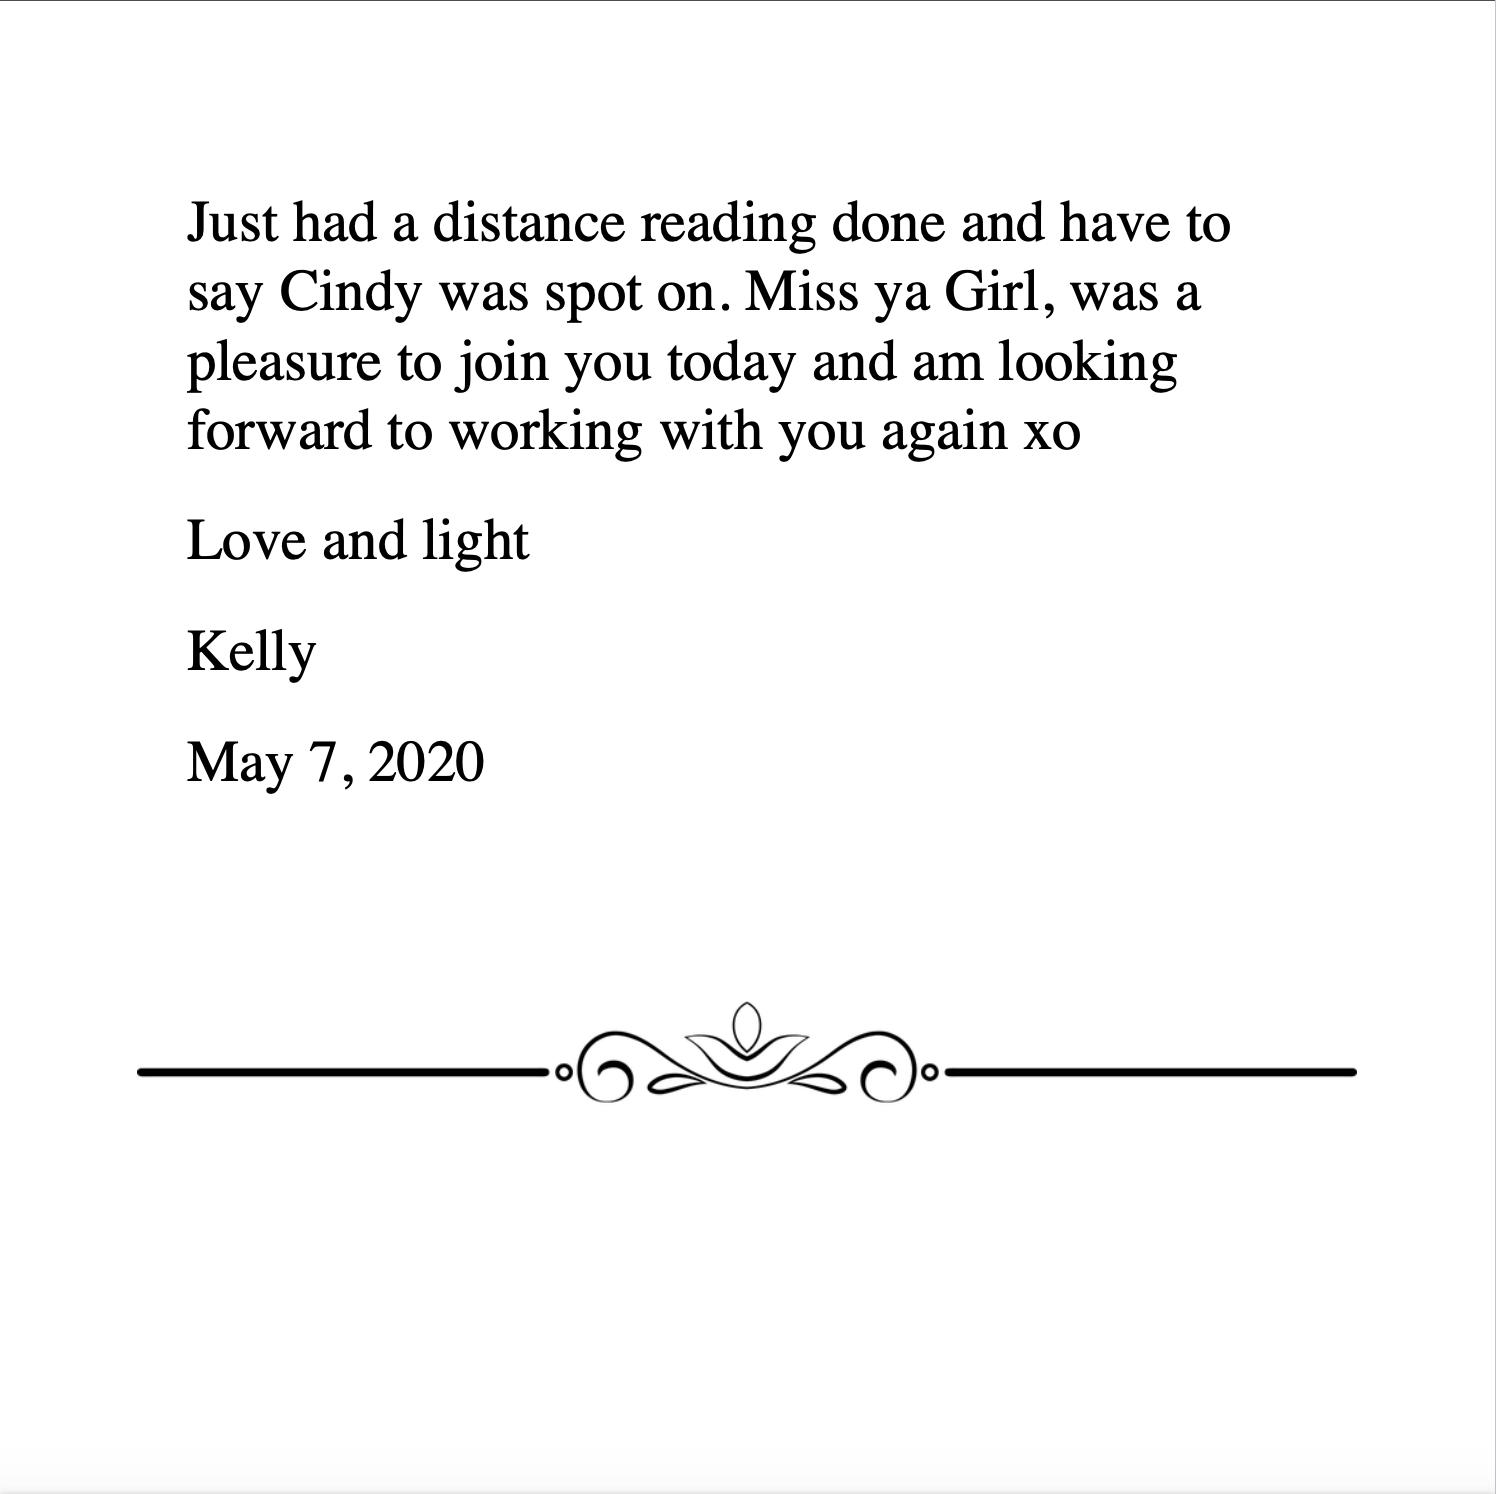 Kelly 5.7.2020